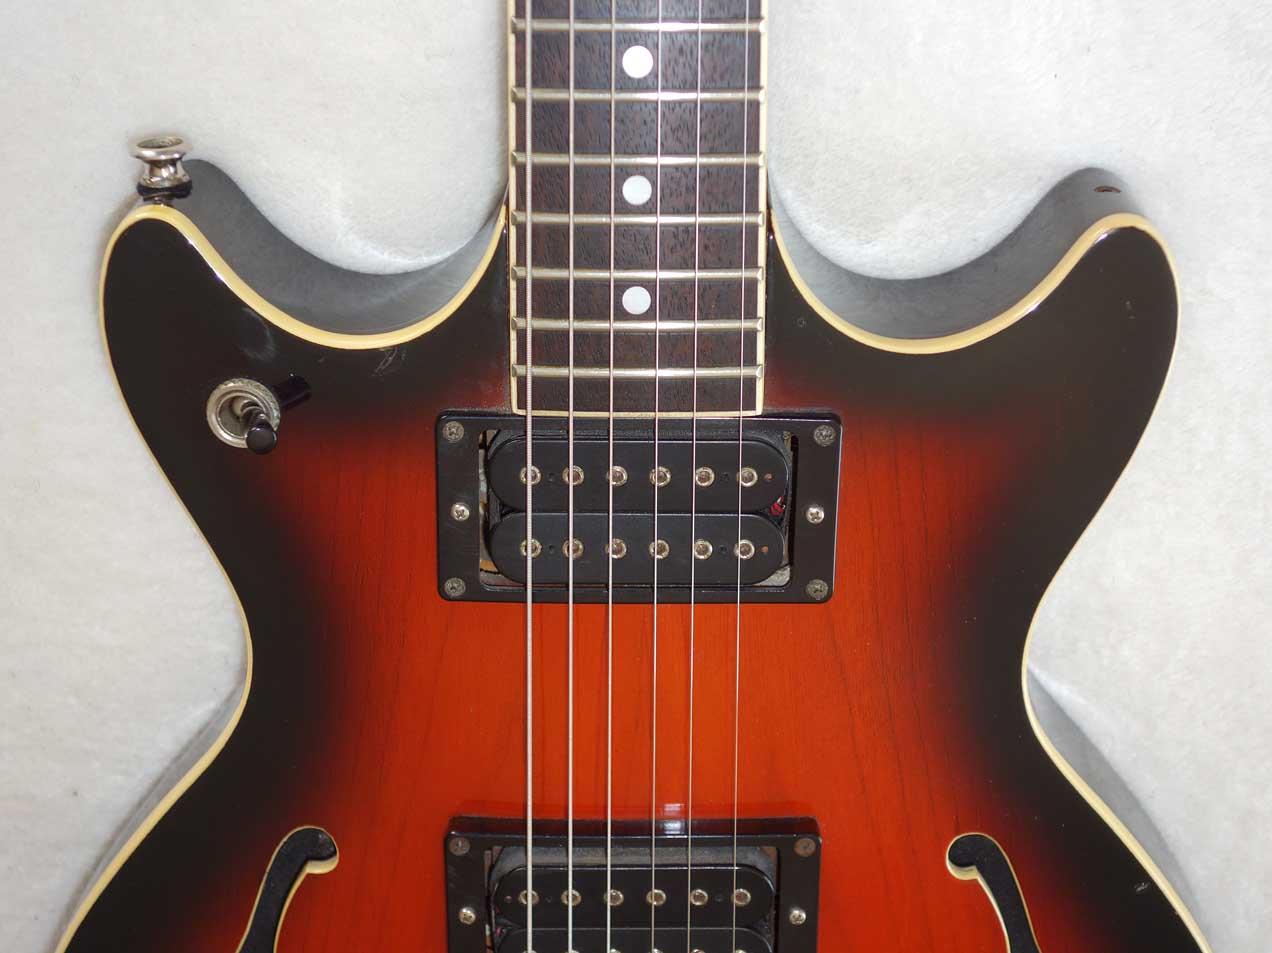 Vintage 1980s Vantage VE-545 Entertainer MIJ Matsumoku Guitar MMK 45 Pups, Coil-Tap